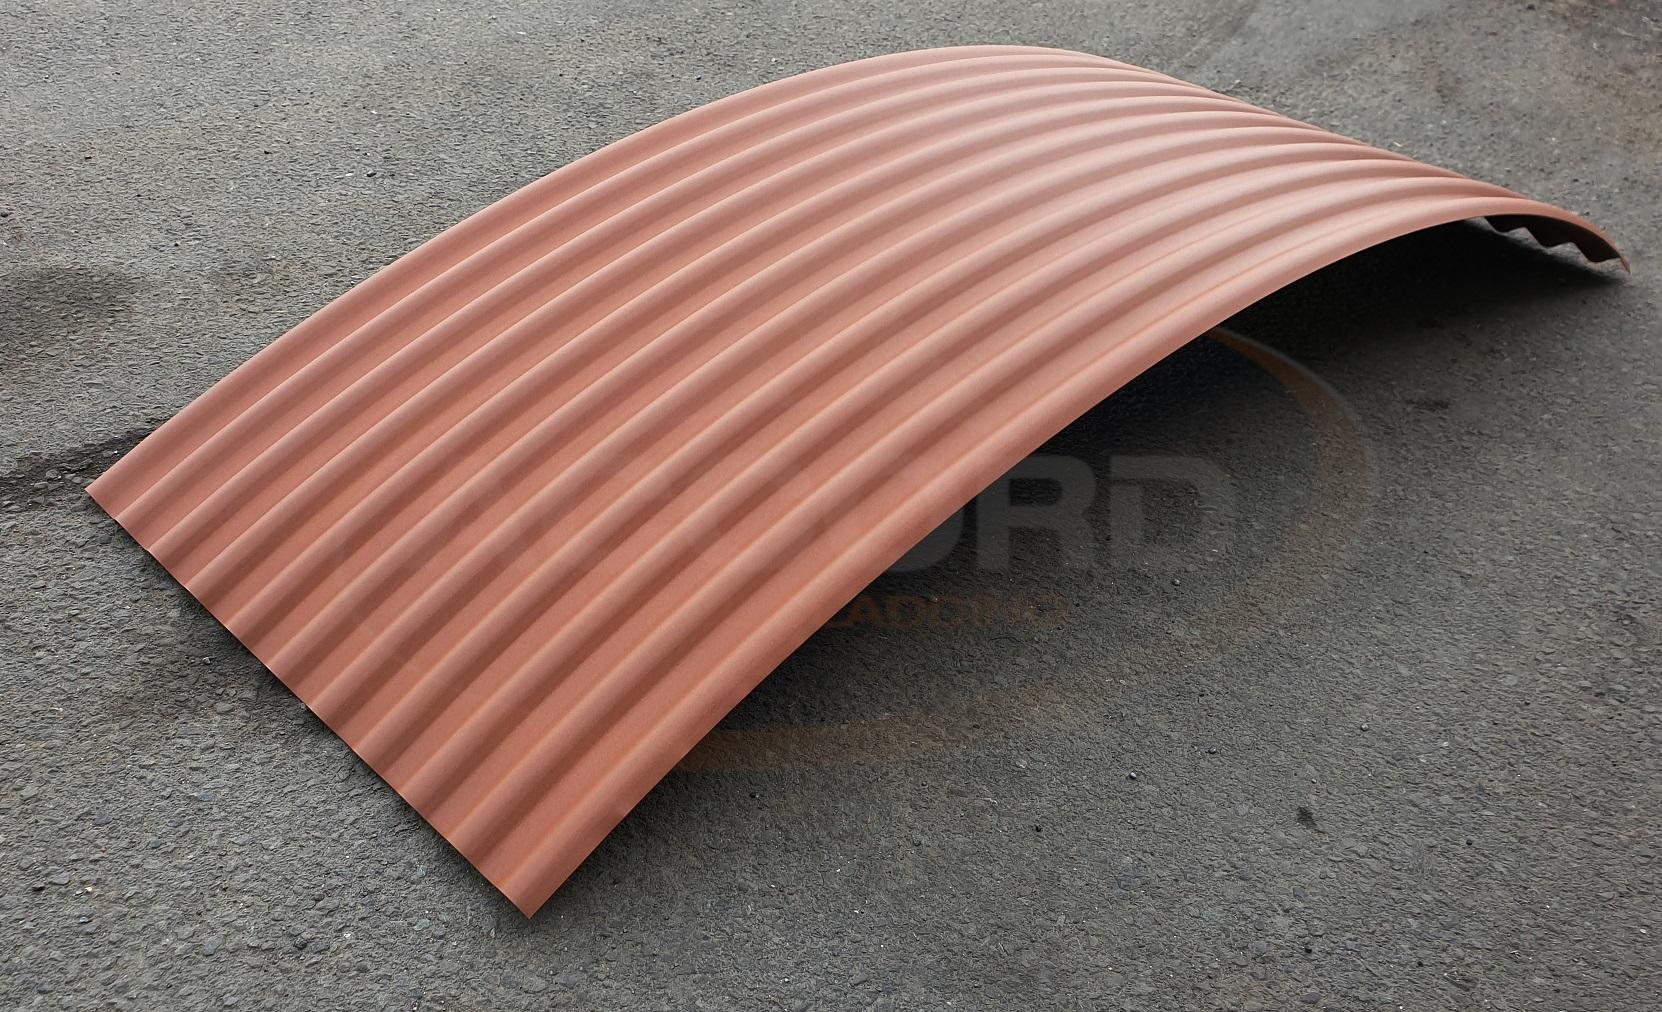 Corten Effect Shepherds Hut Roof Sheets Accord Steel Cladding